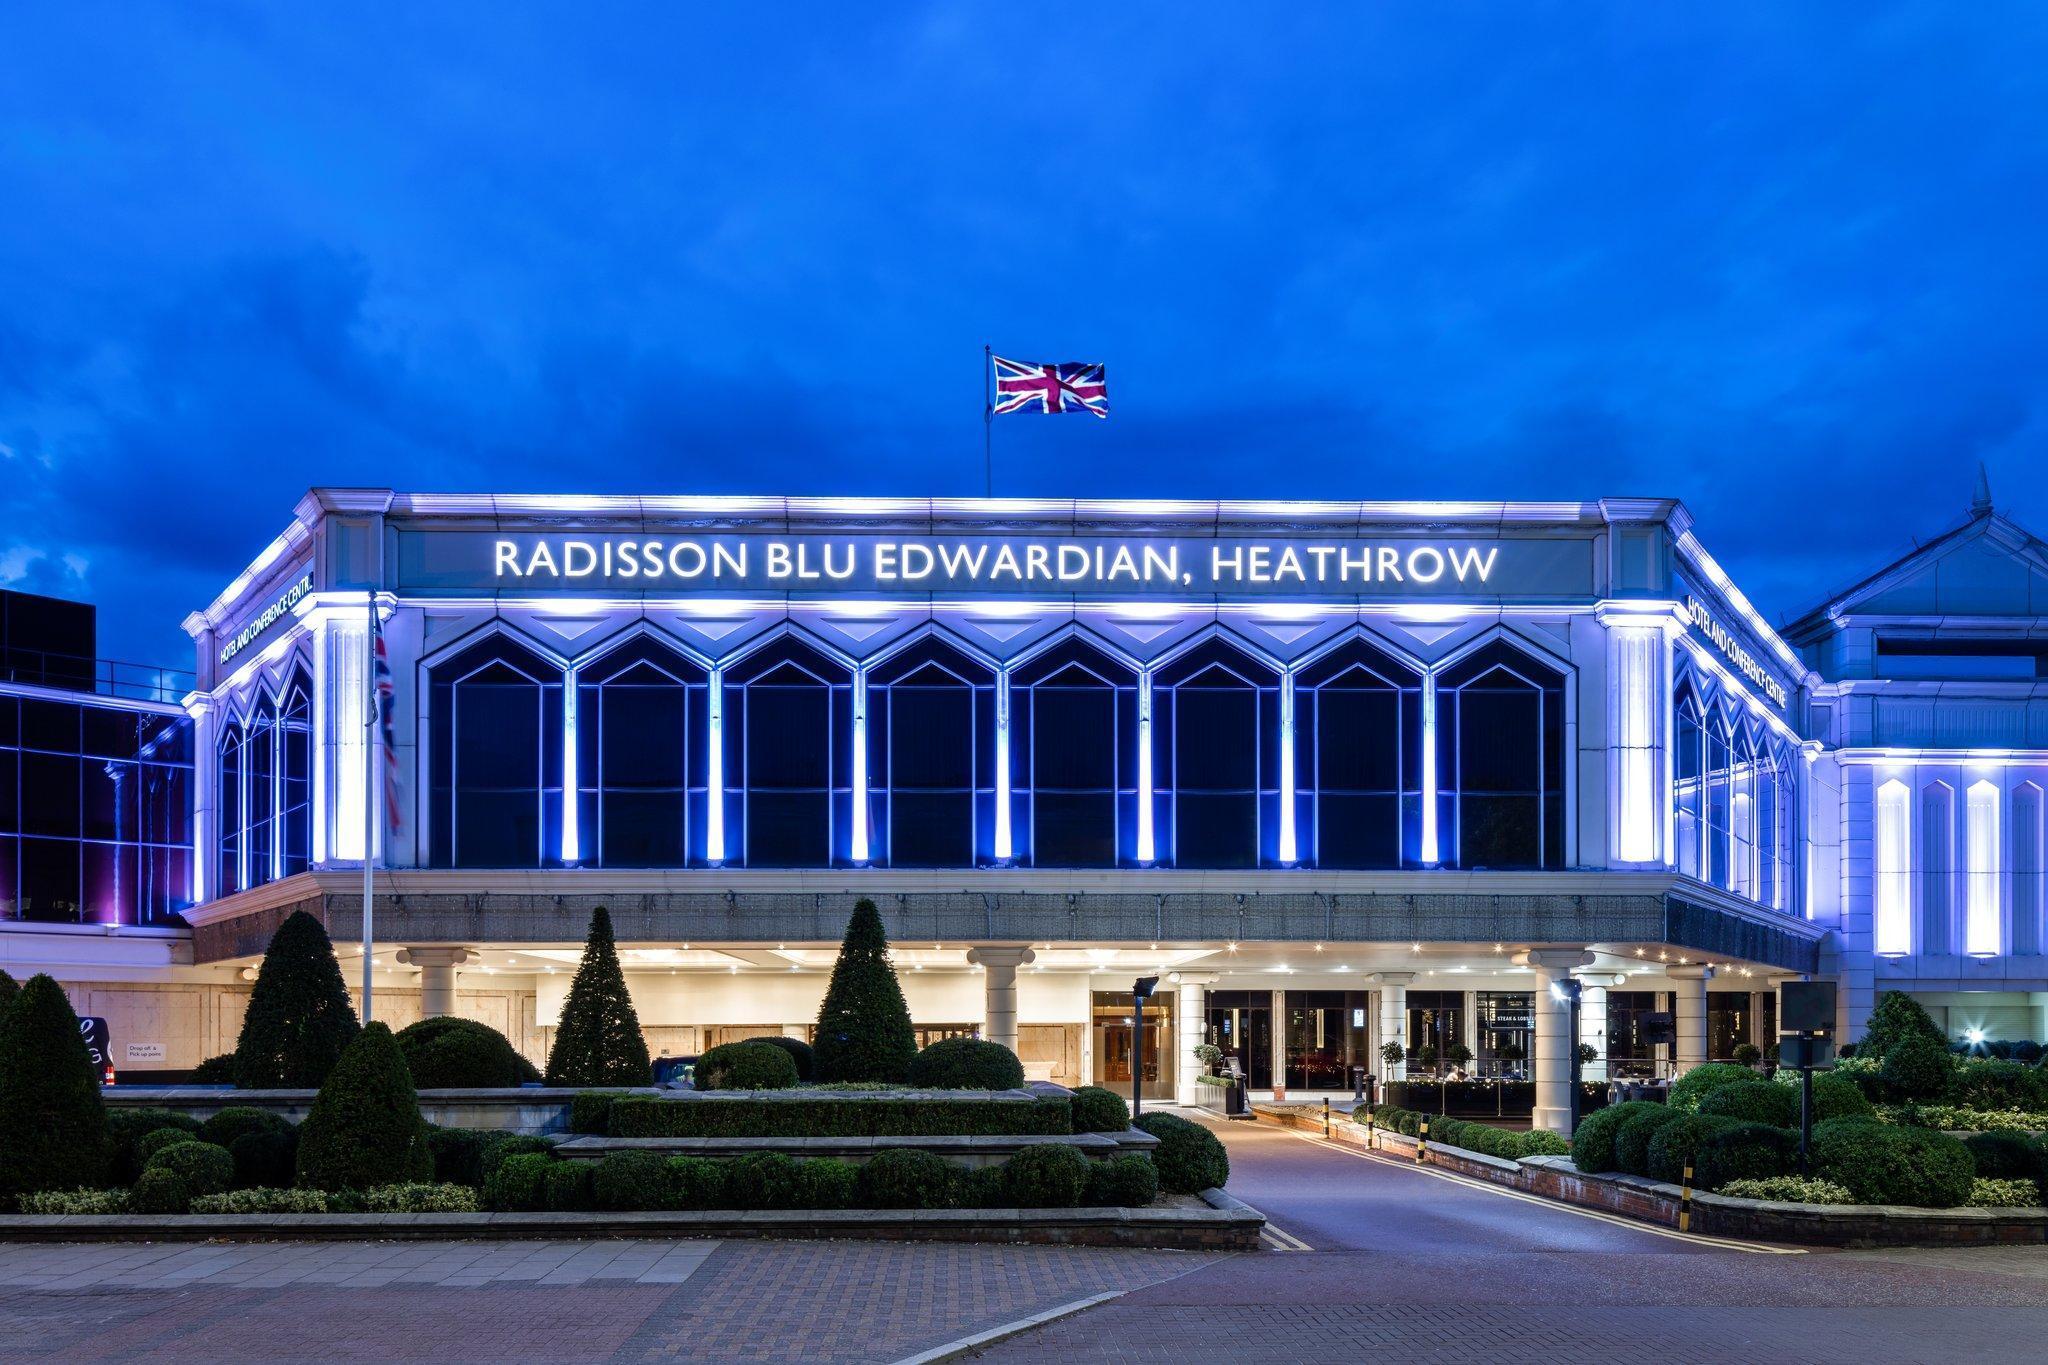 Radisson Blu Edwardian Heathrow - Heathrow Airport, London